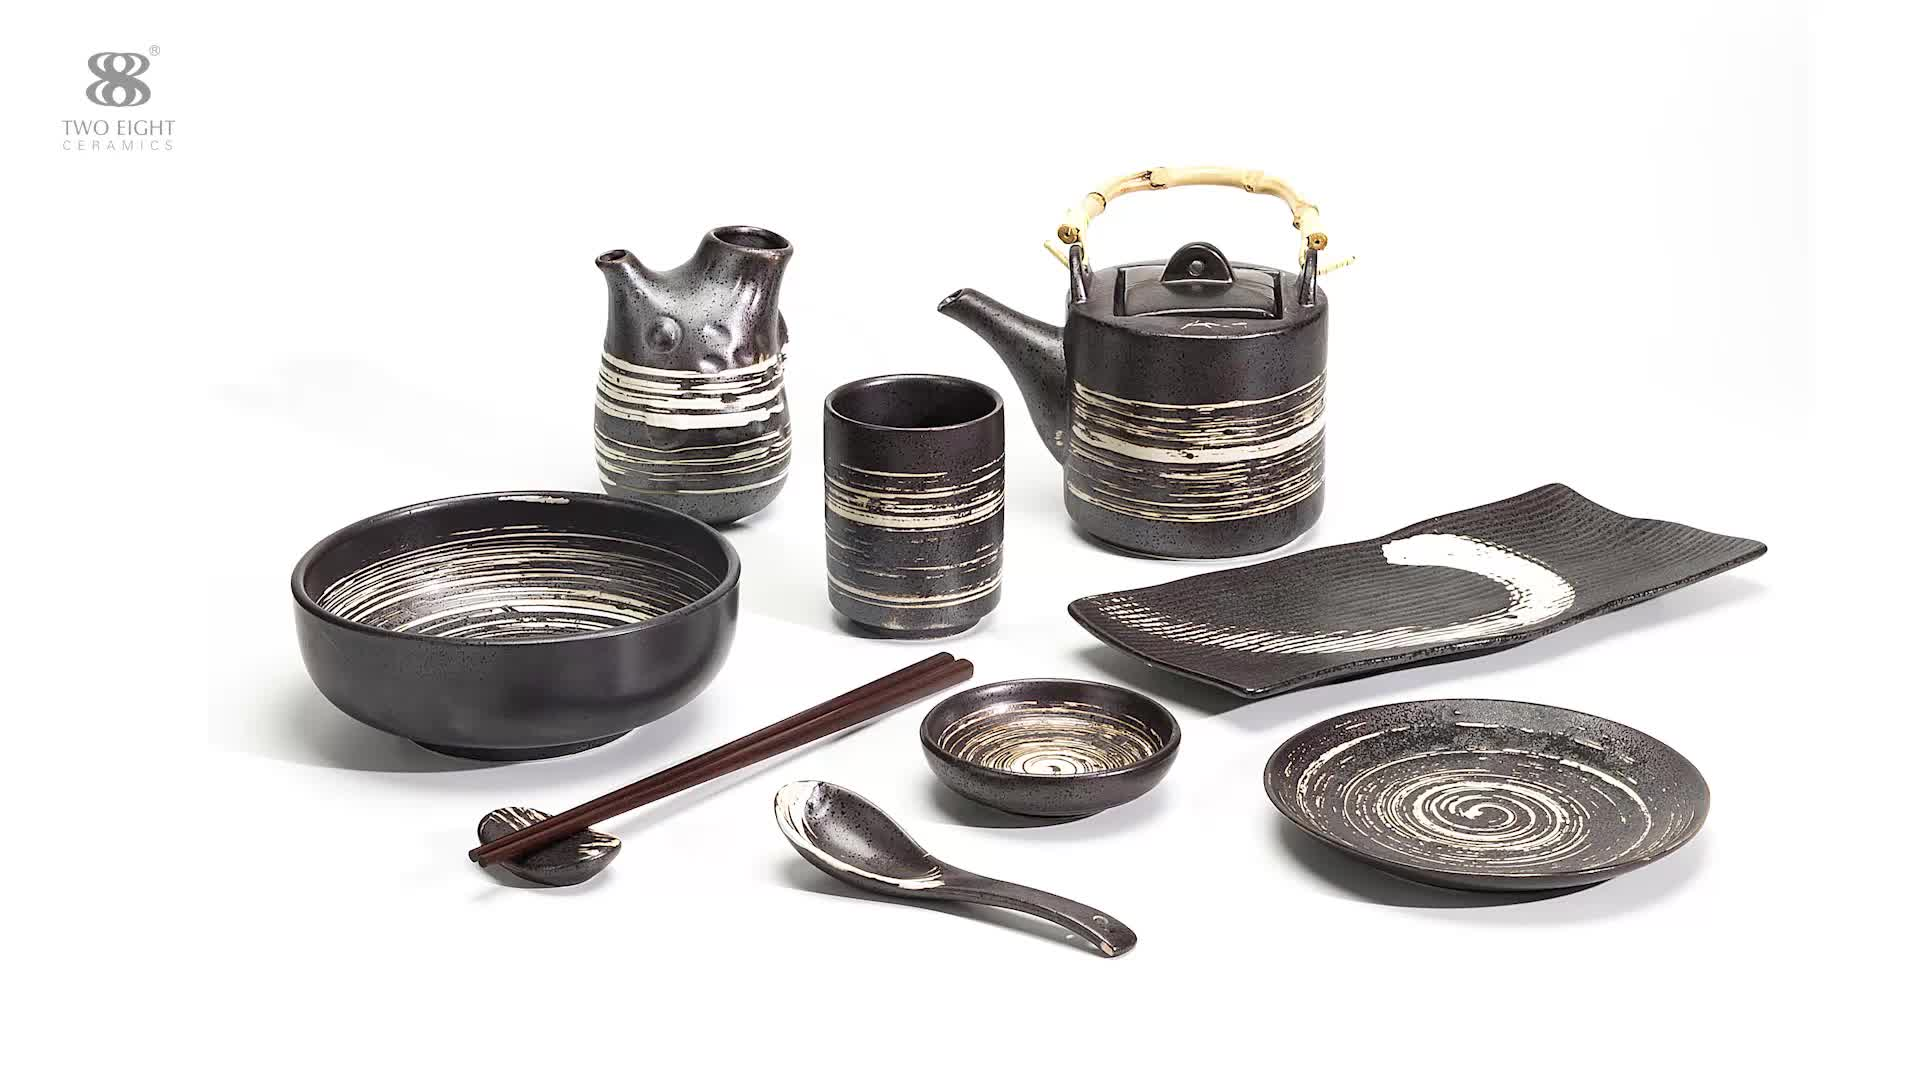 Direct Sale Party Microwave Safe White Ceramic Dinner Set, Dinnerware Black~